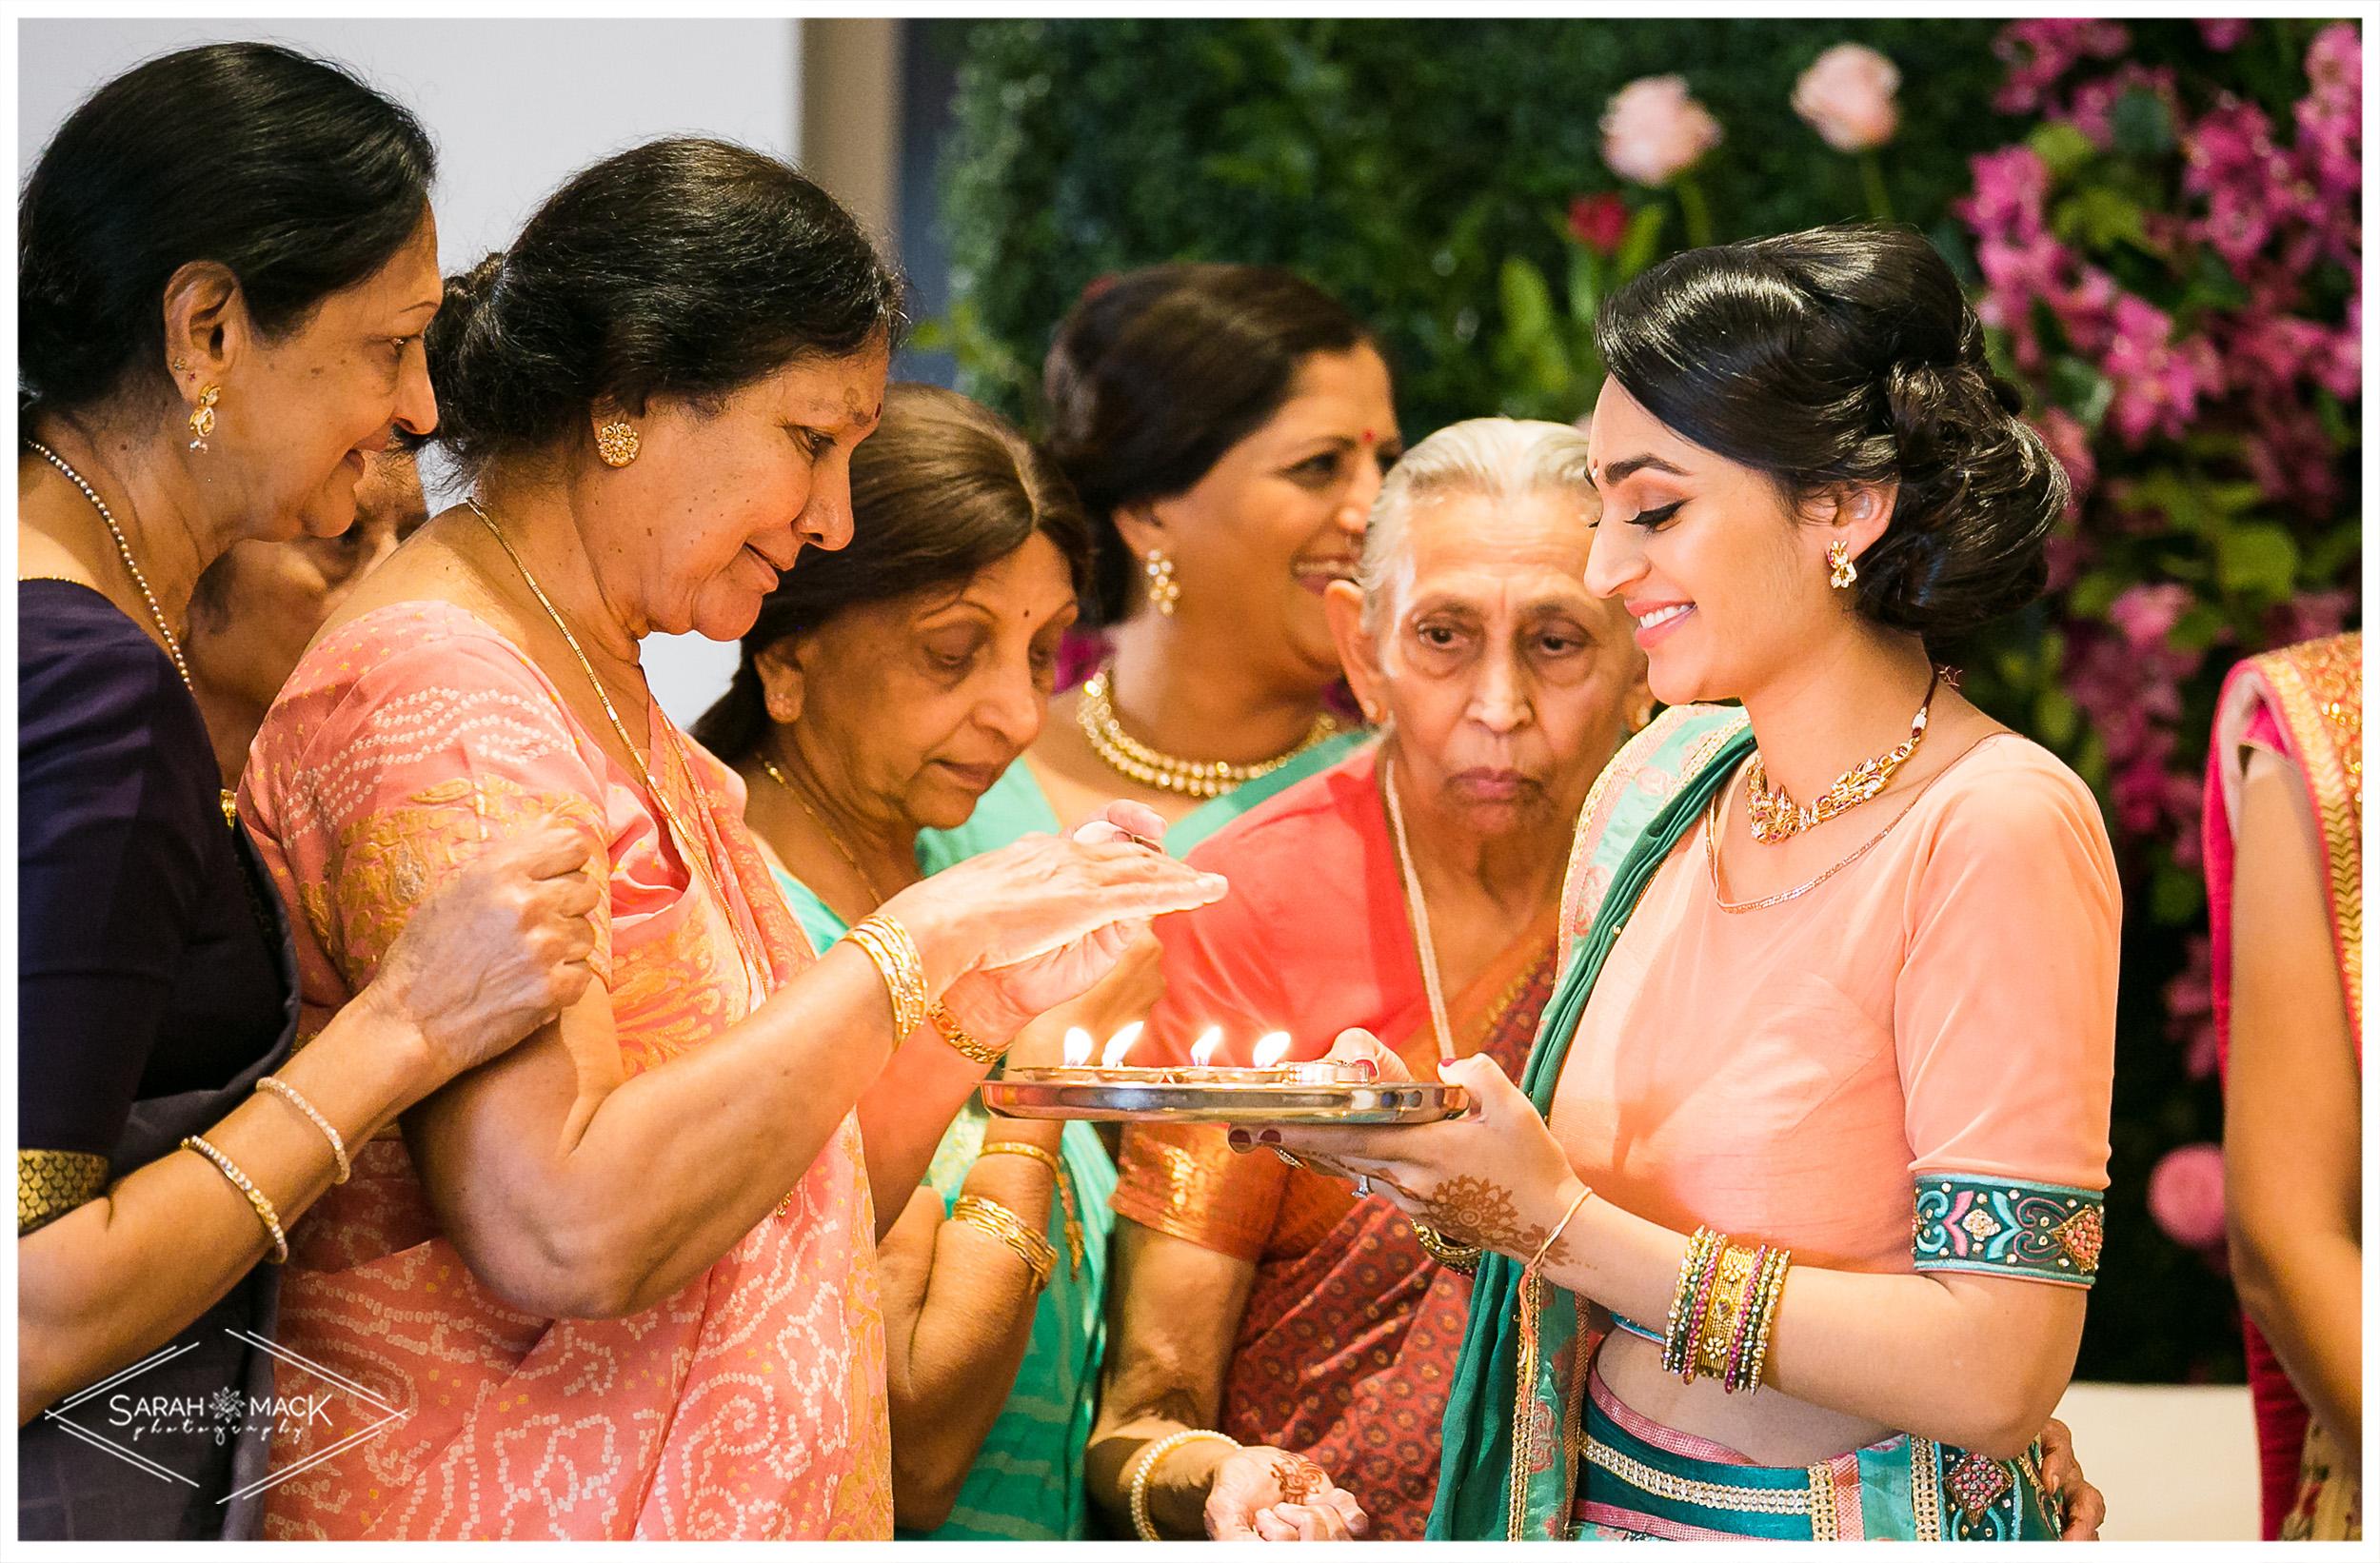 PR-Irvine-Ganesh-Pooja-Indian-Wedding-Photography-20.jpg